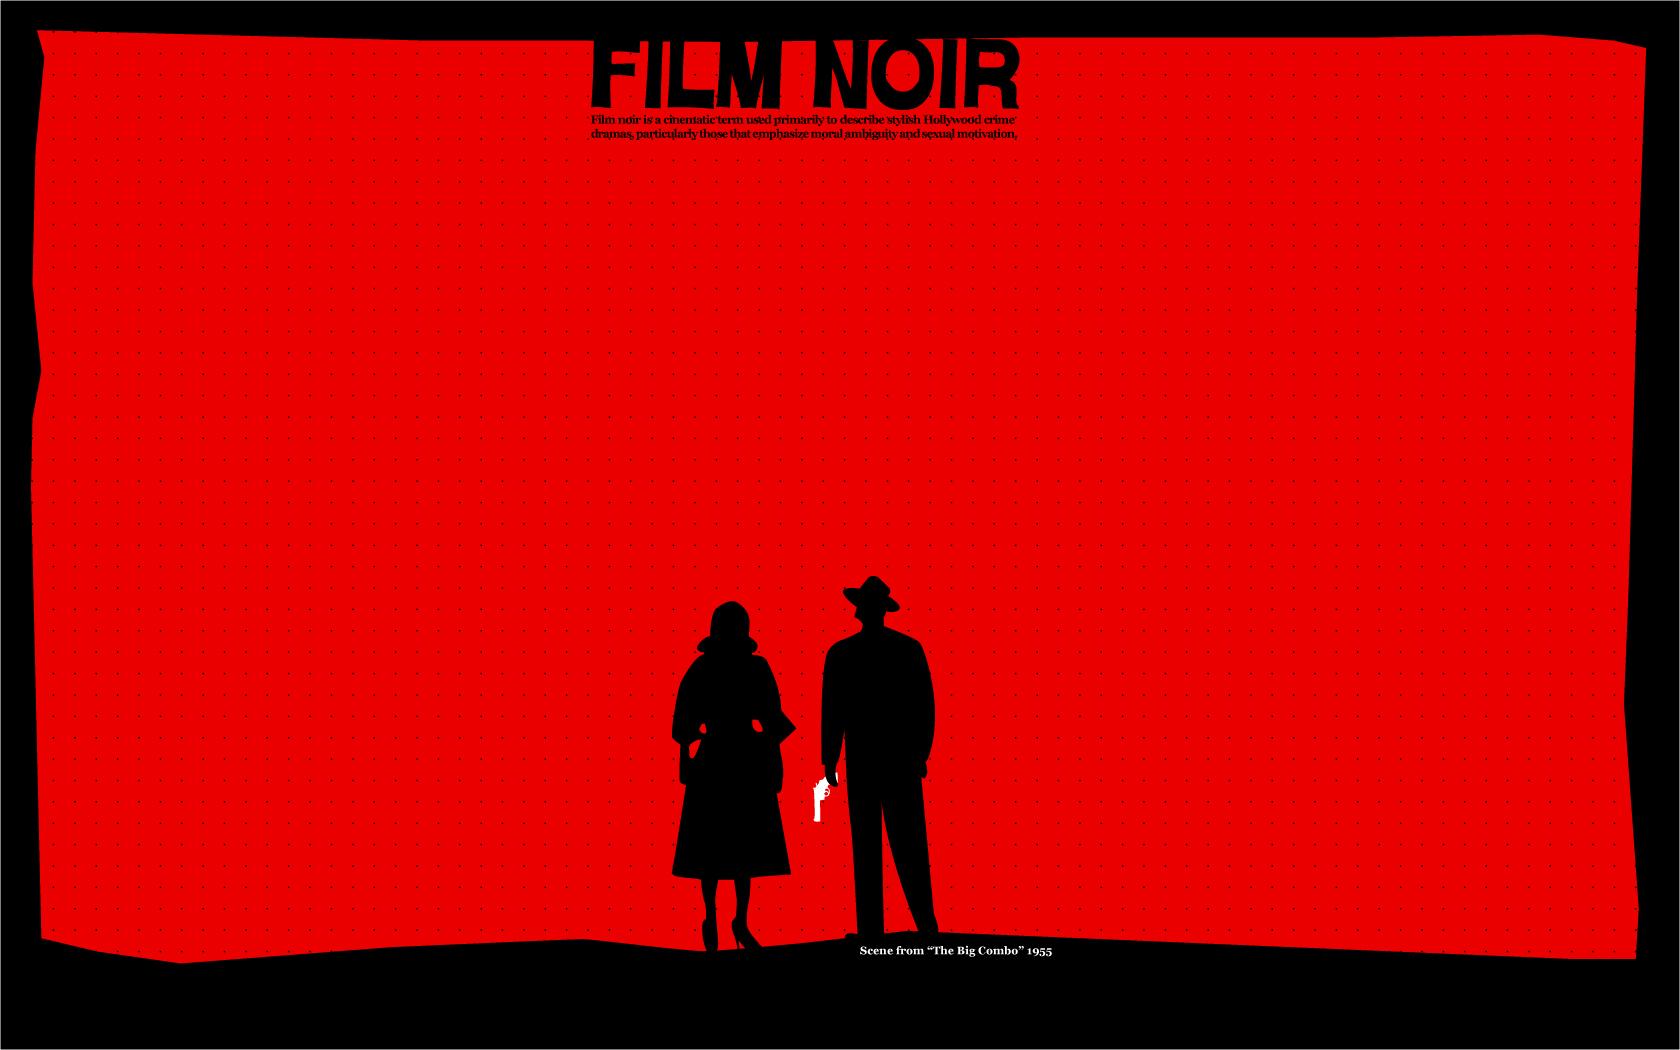 film noir wallpaper by B positive 1680x1050